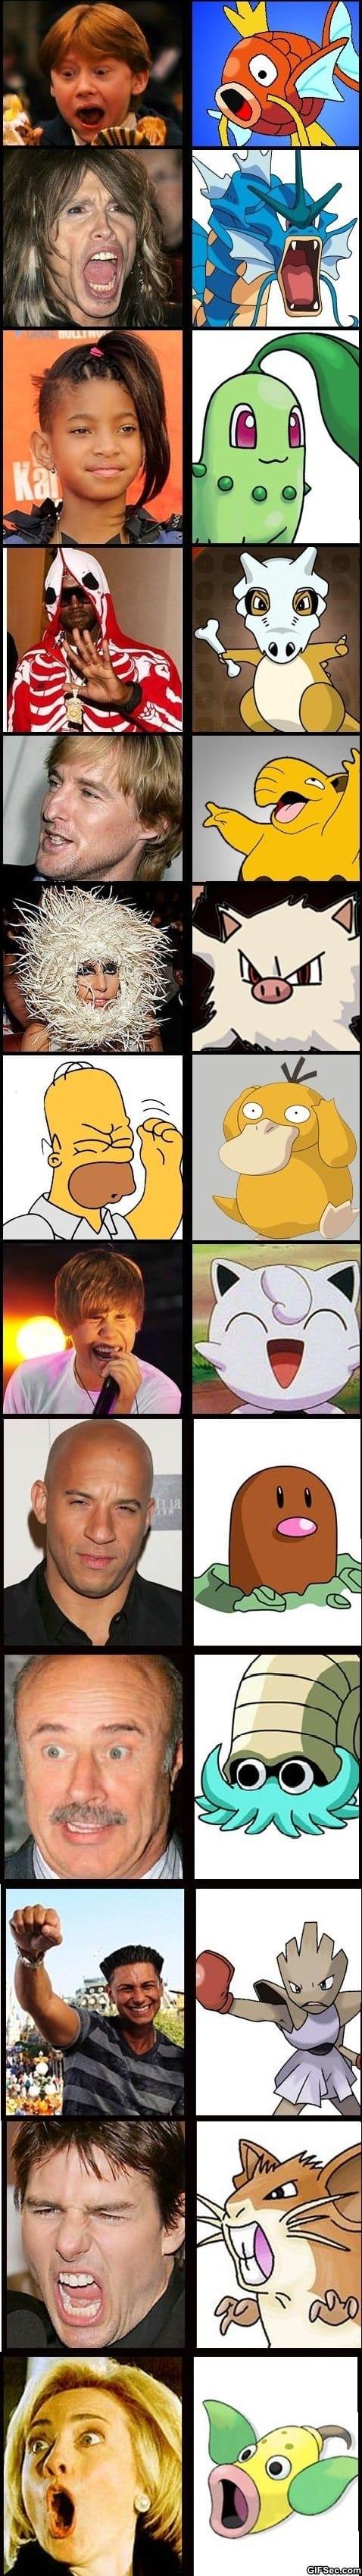 celebrity-look-alikes